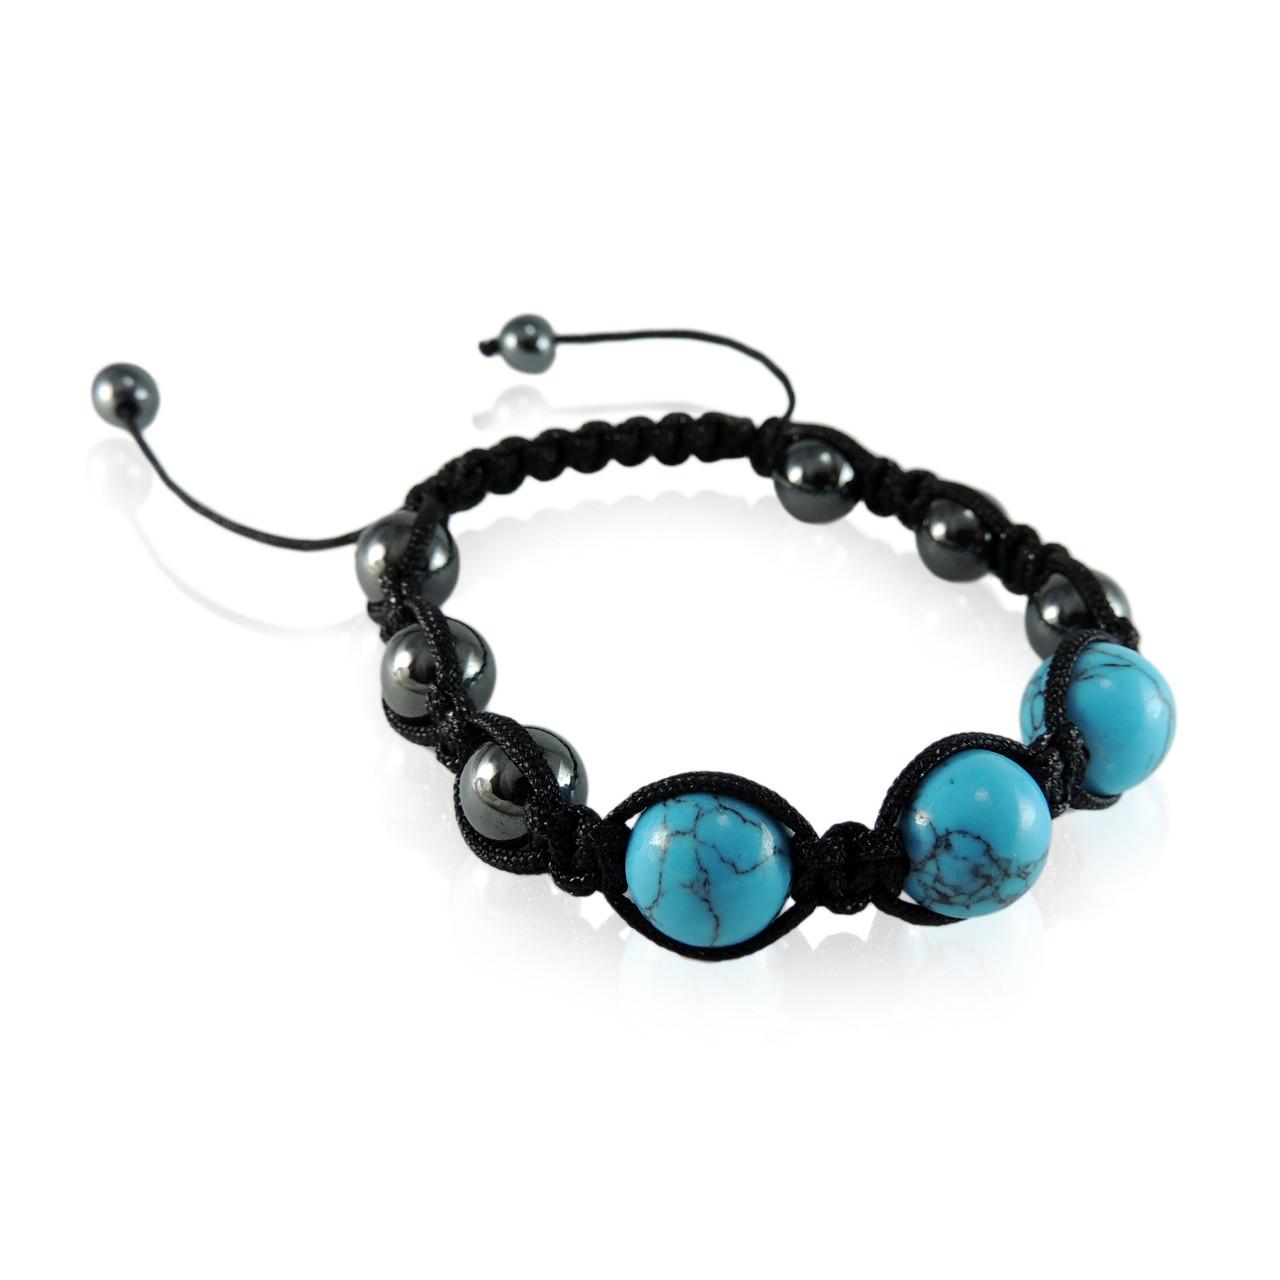 GBTQ-KGB10tq Turquoise Howlite Magnetic Bracelet